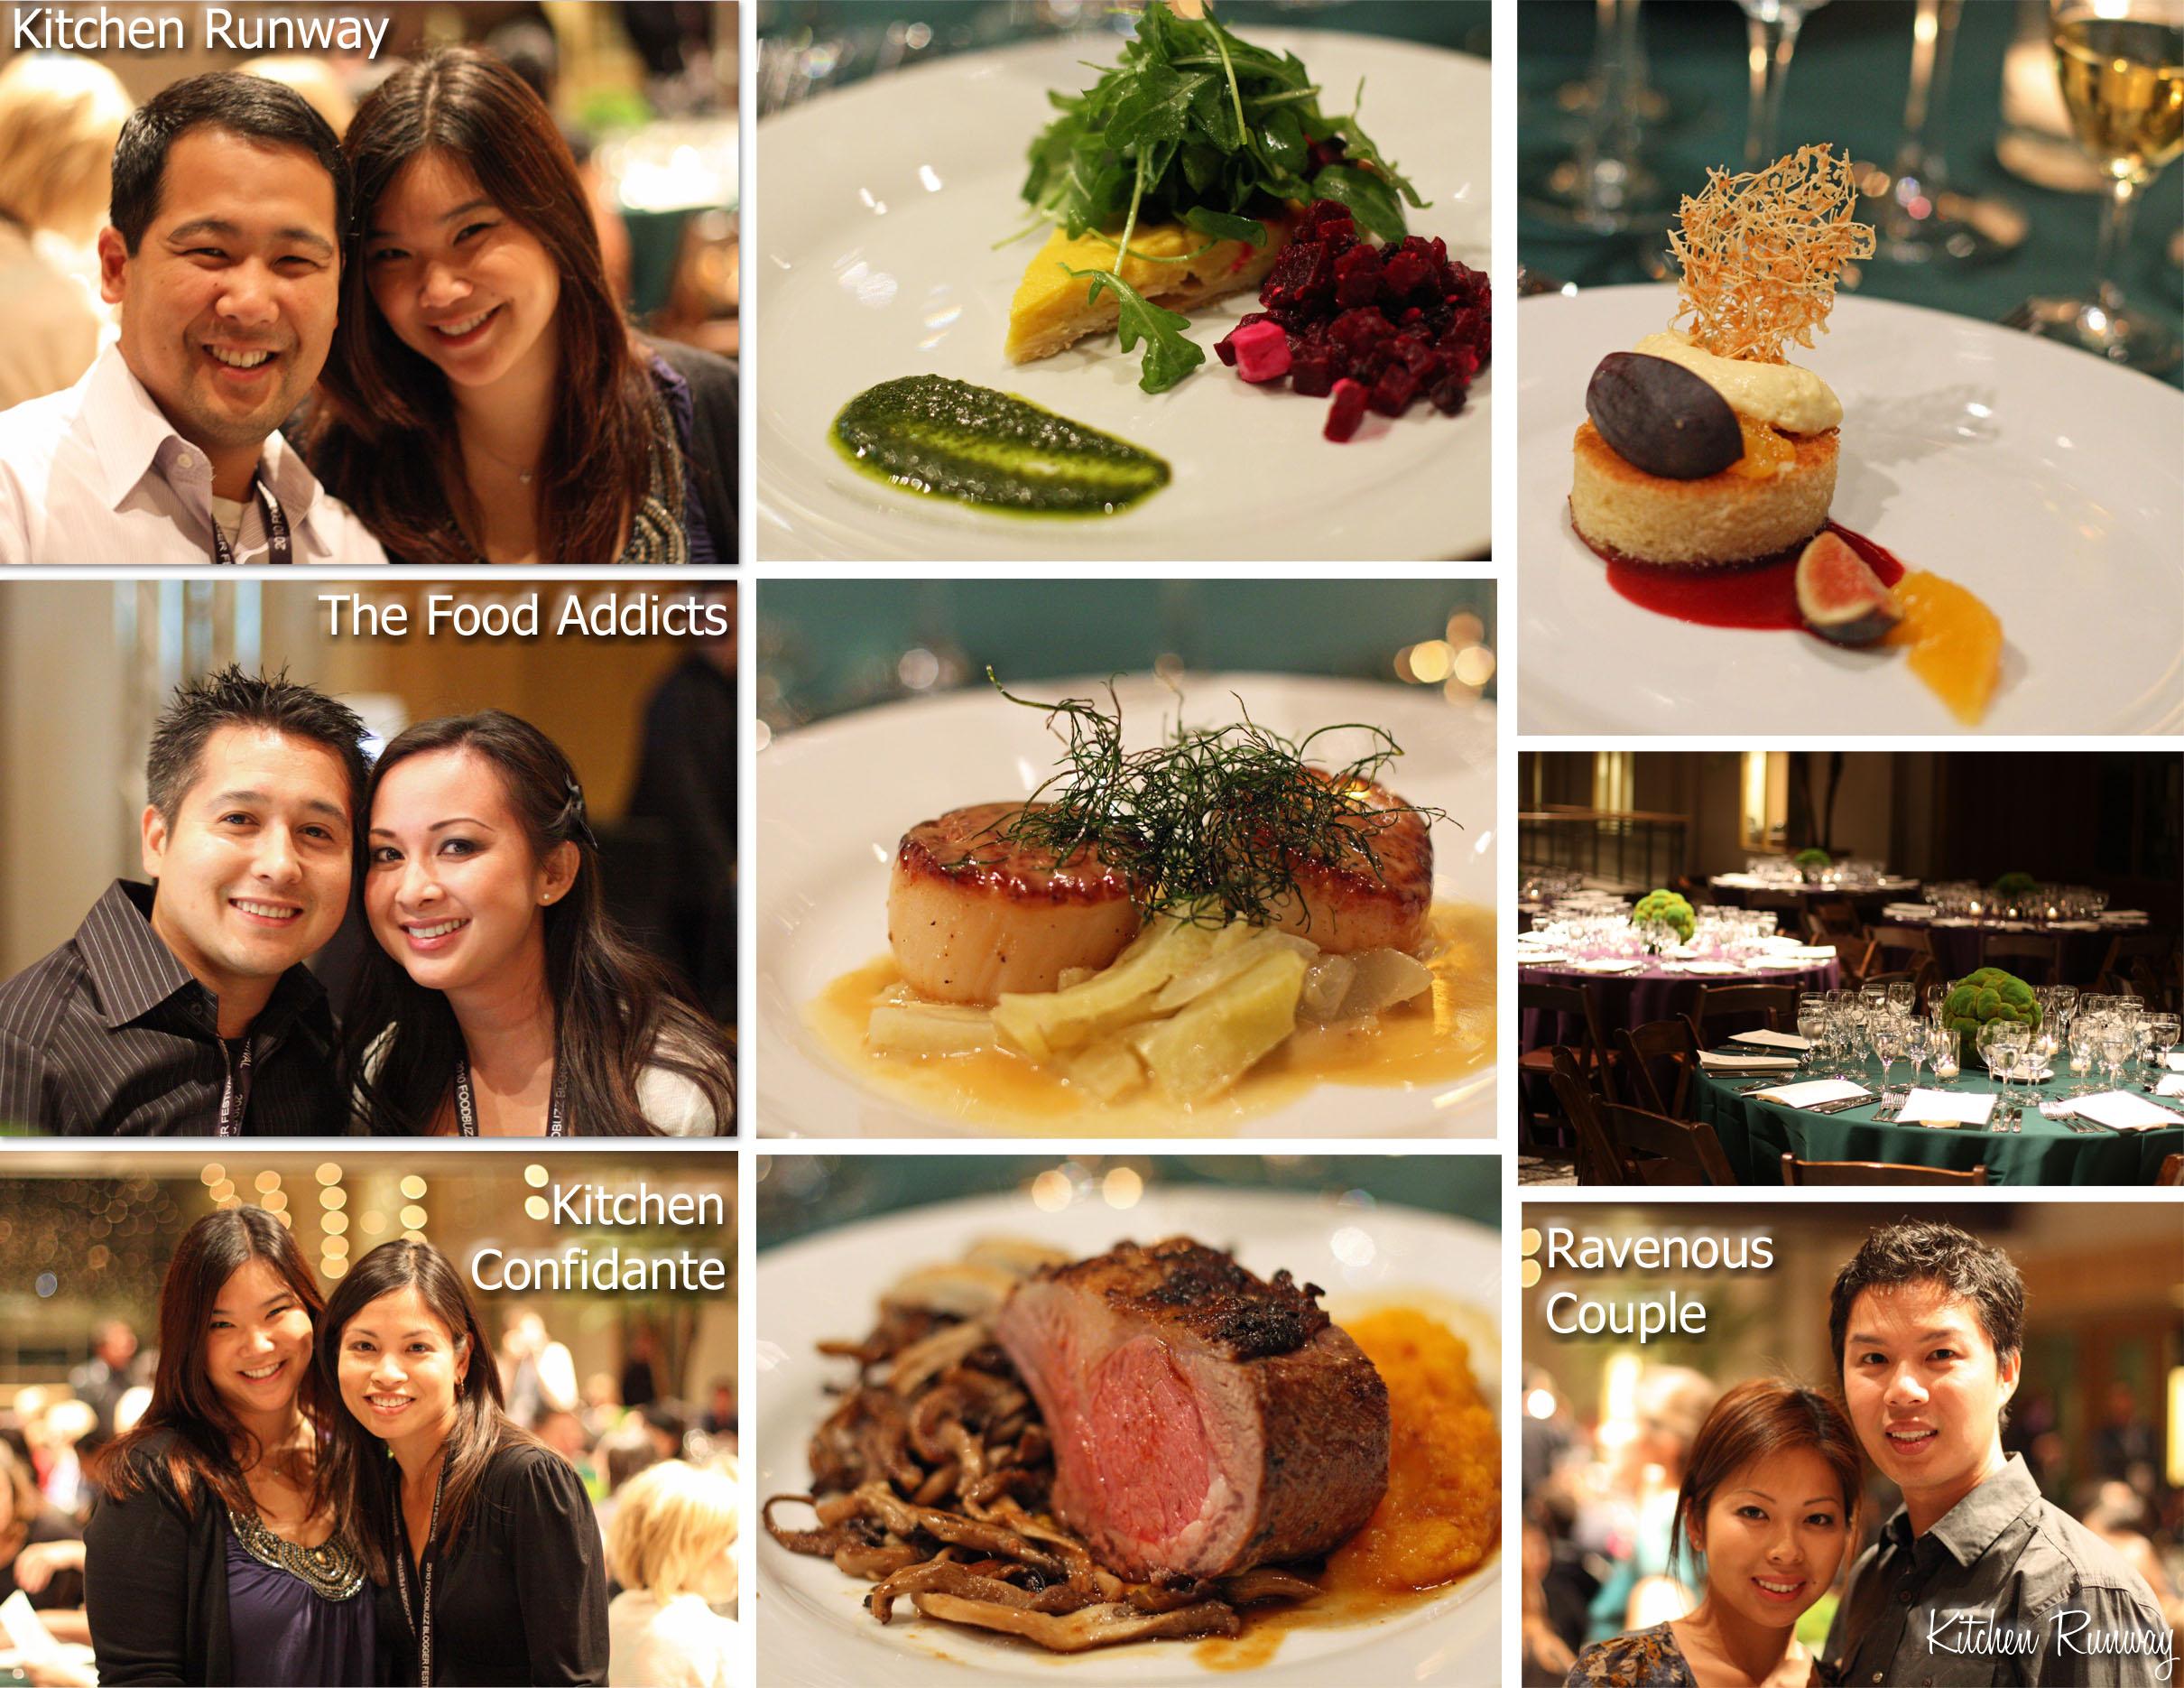 gala dinner collage